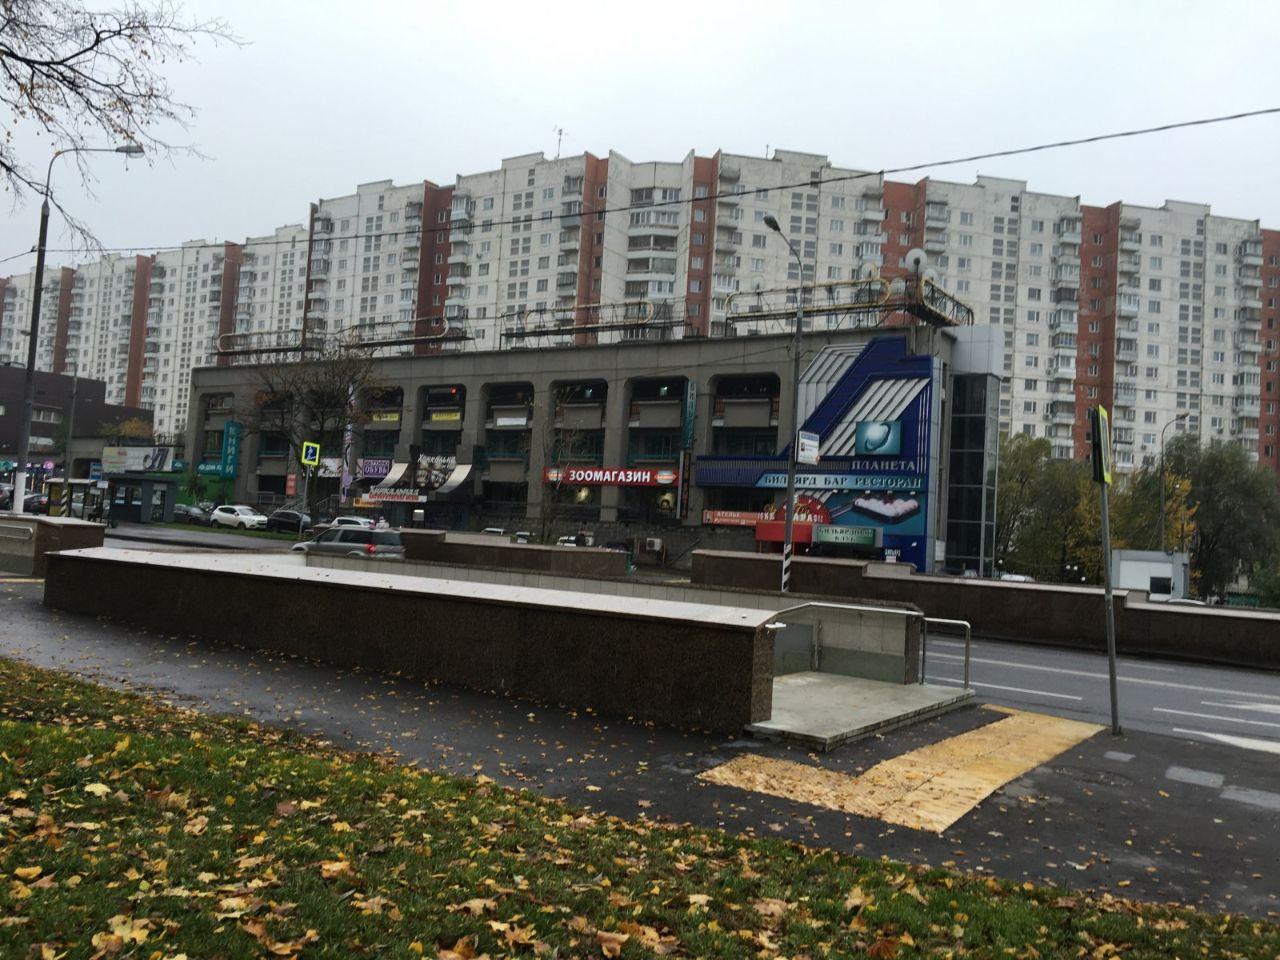 Аренда коммерческой недвижимости на ул миклуха маклай аренда офиса м волгоградский пр-т